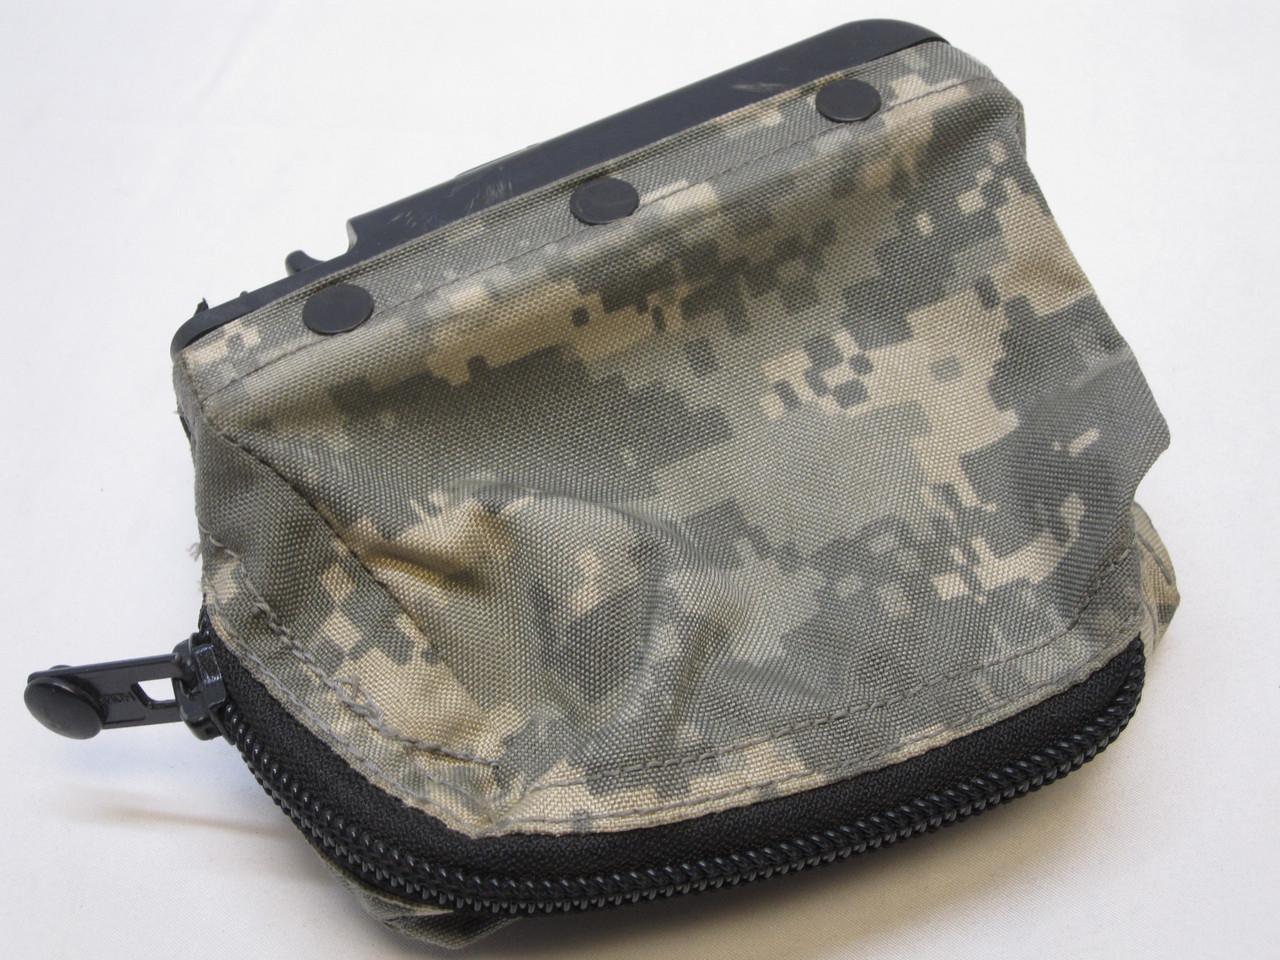 USED ACU DIGITAL M249 AMMO POUCH 100 ROUND SOFT PACK NUT SACK SAW 5.56